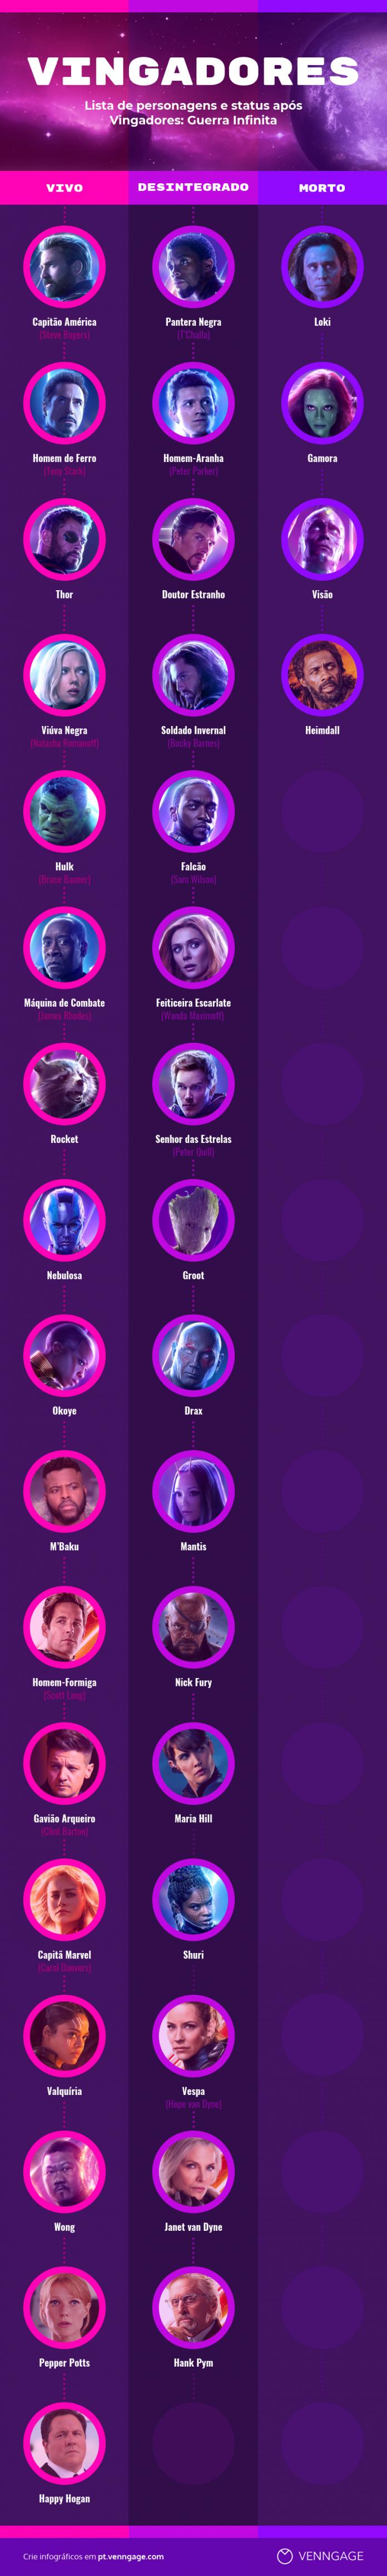 infográfico personagens de vingadores ultimato